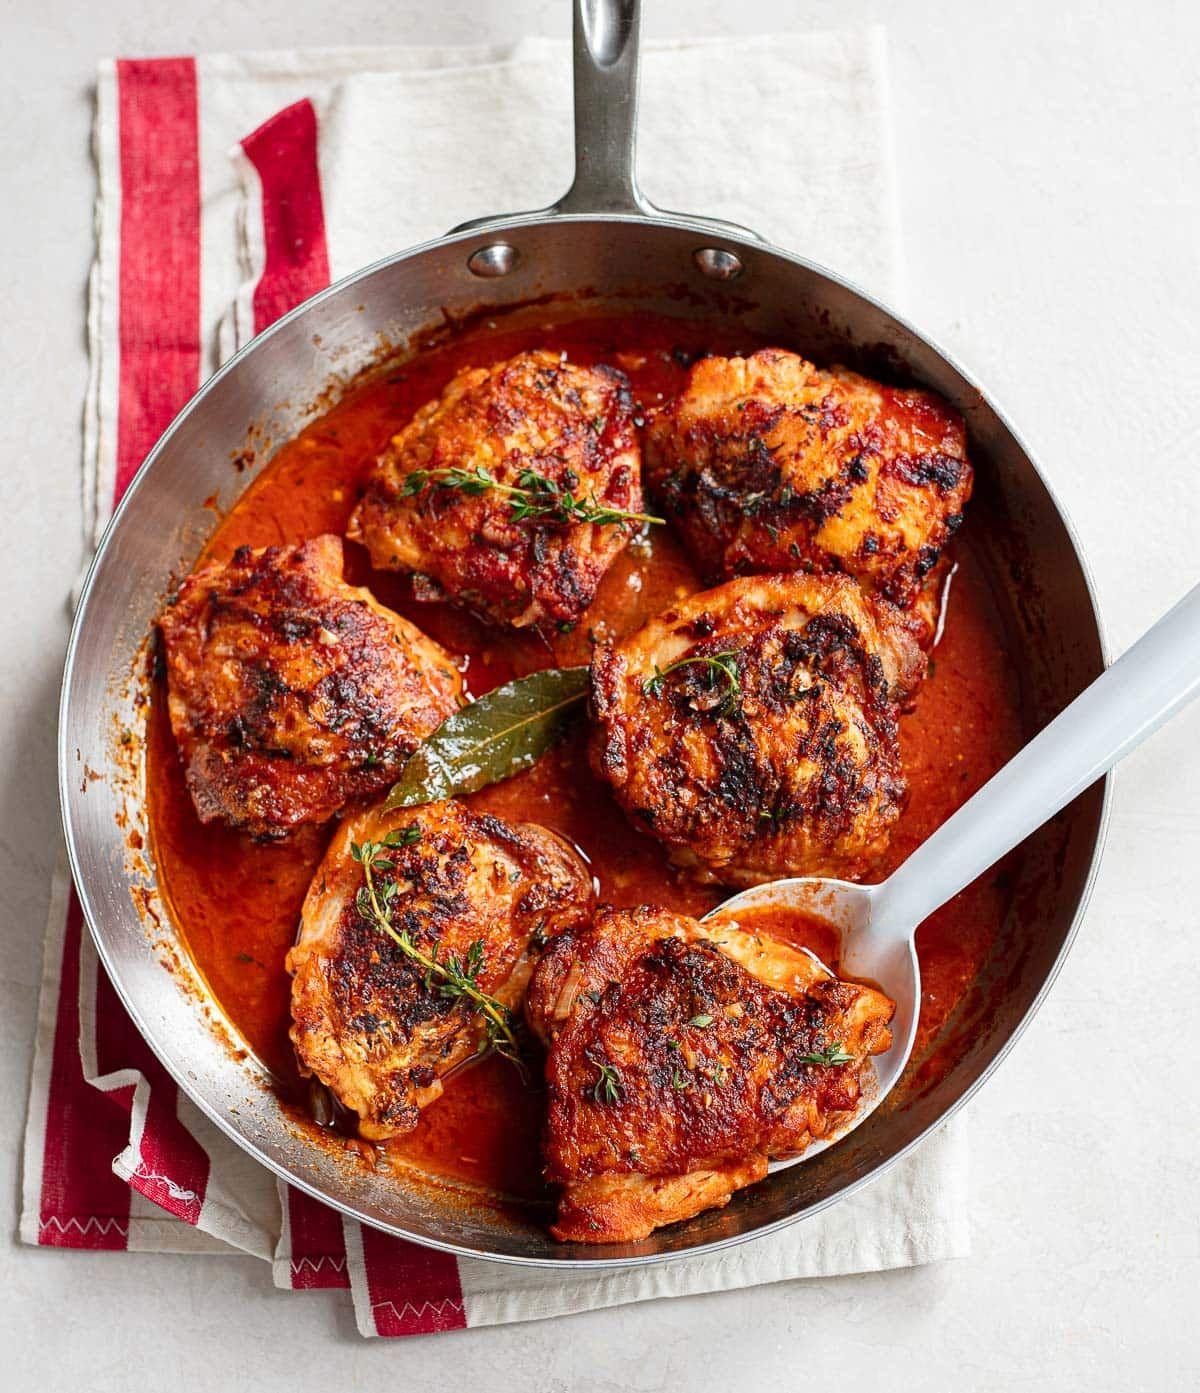 French Style Chicken In Red Wine Vinegar Sauce In 2020 Red Wine Vinegar Recipes Easy Chicken Dinner Recipes Red Wine Recipes Chicken